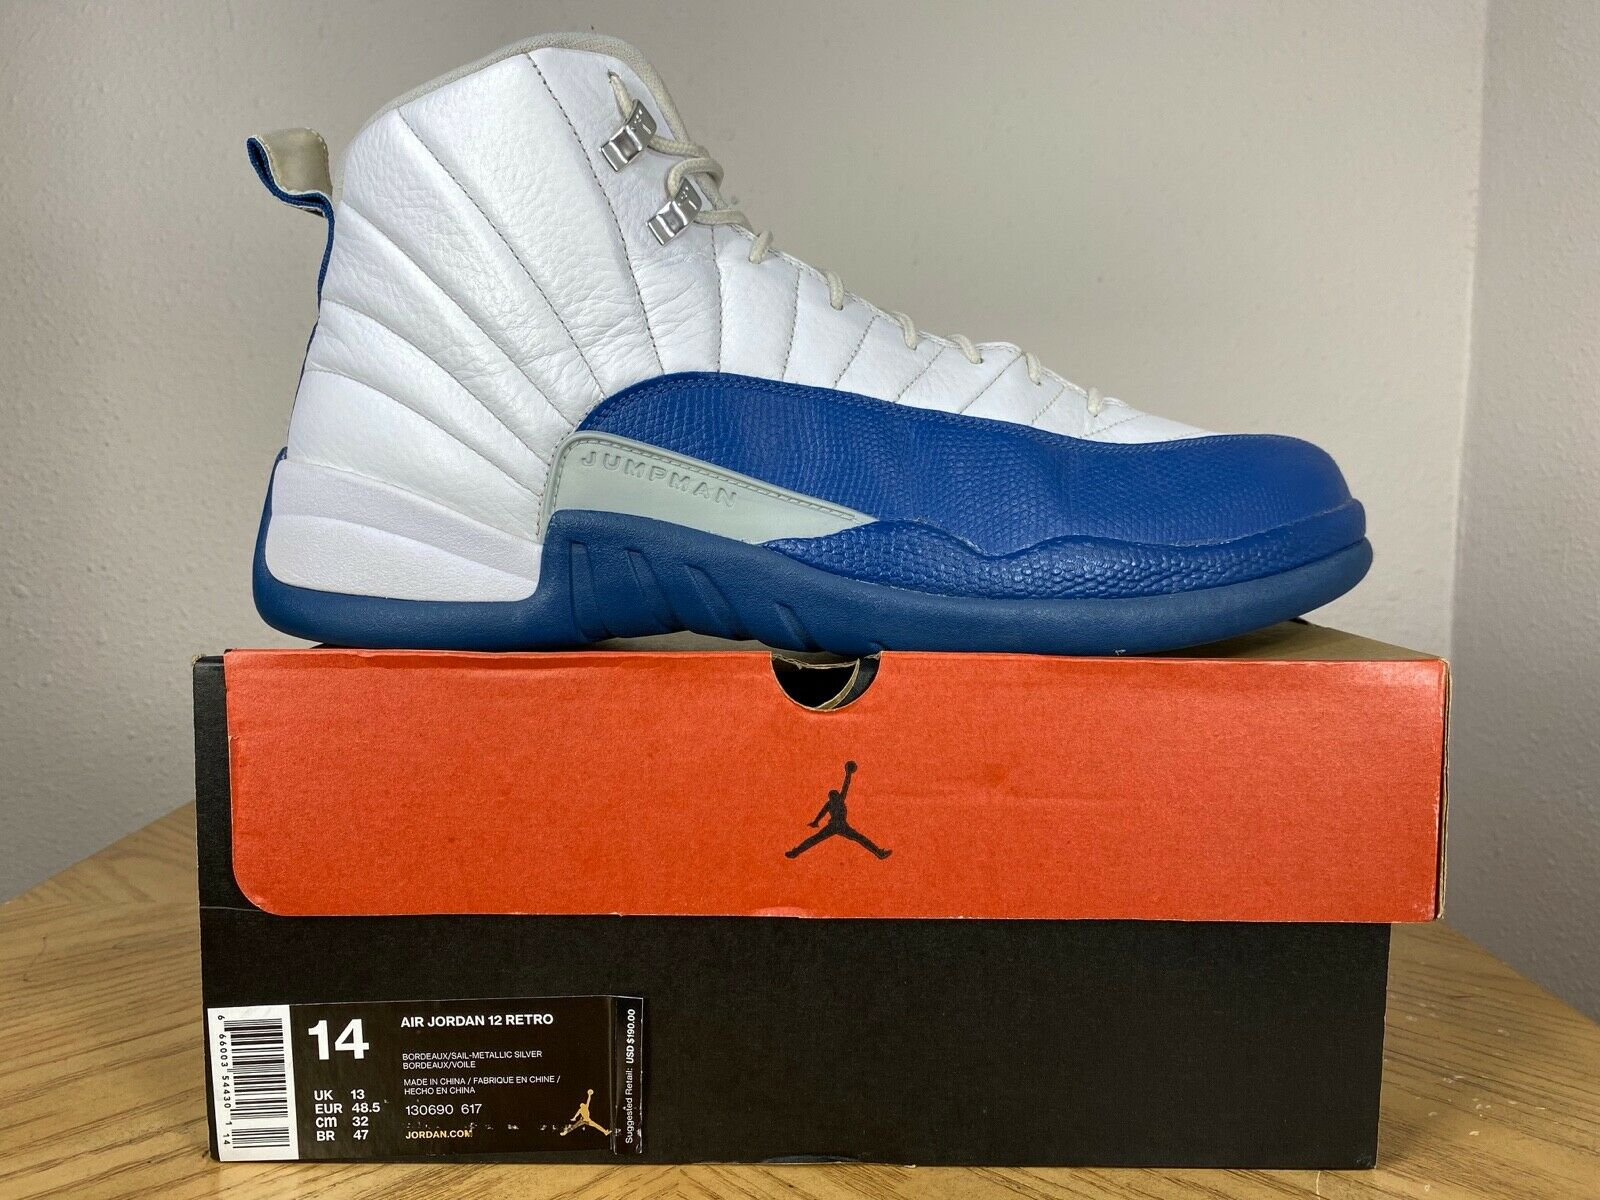 Jordan 12 Retro French Blue 2016